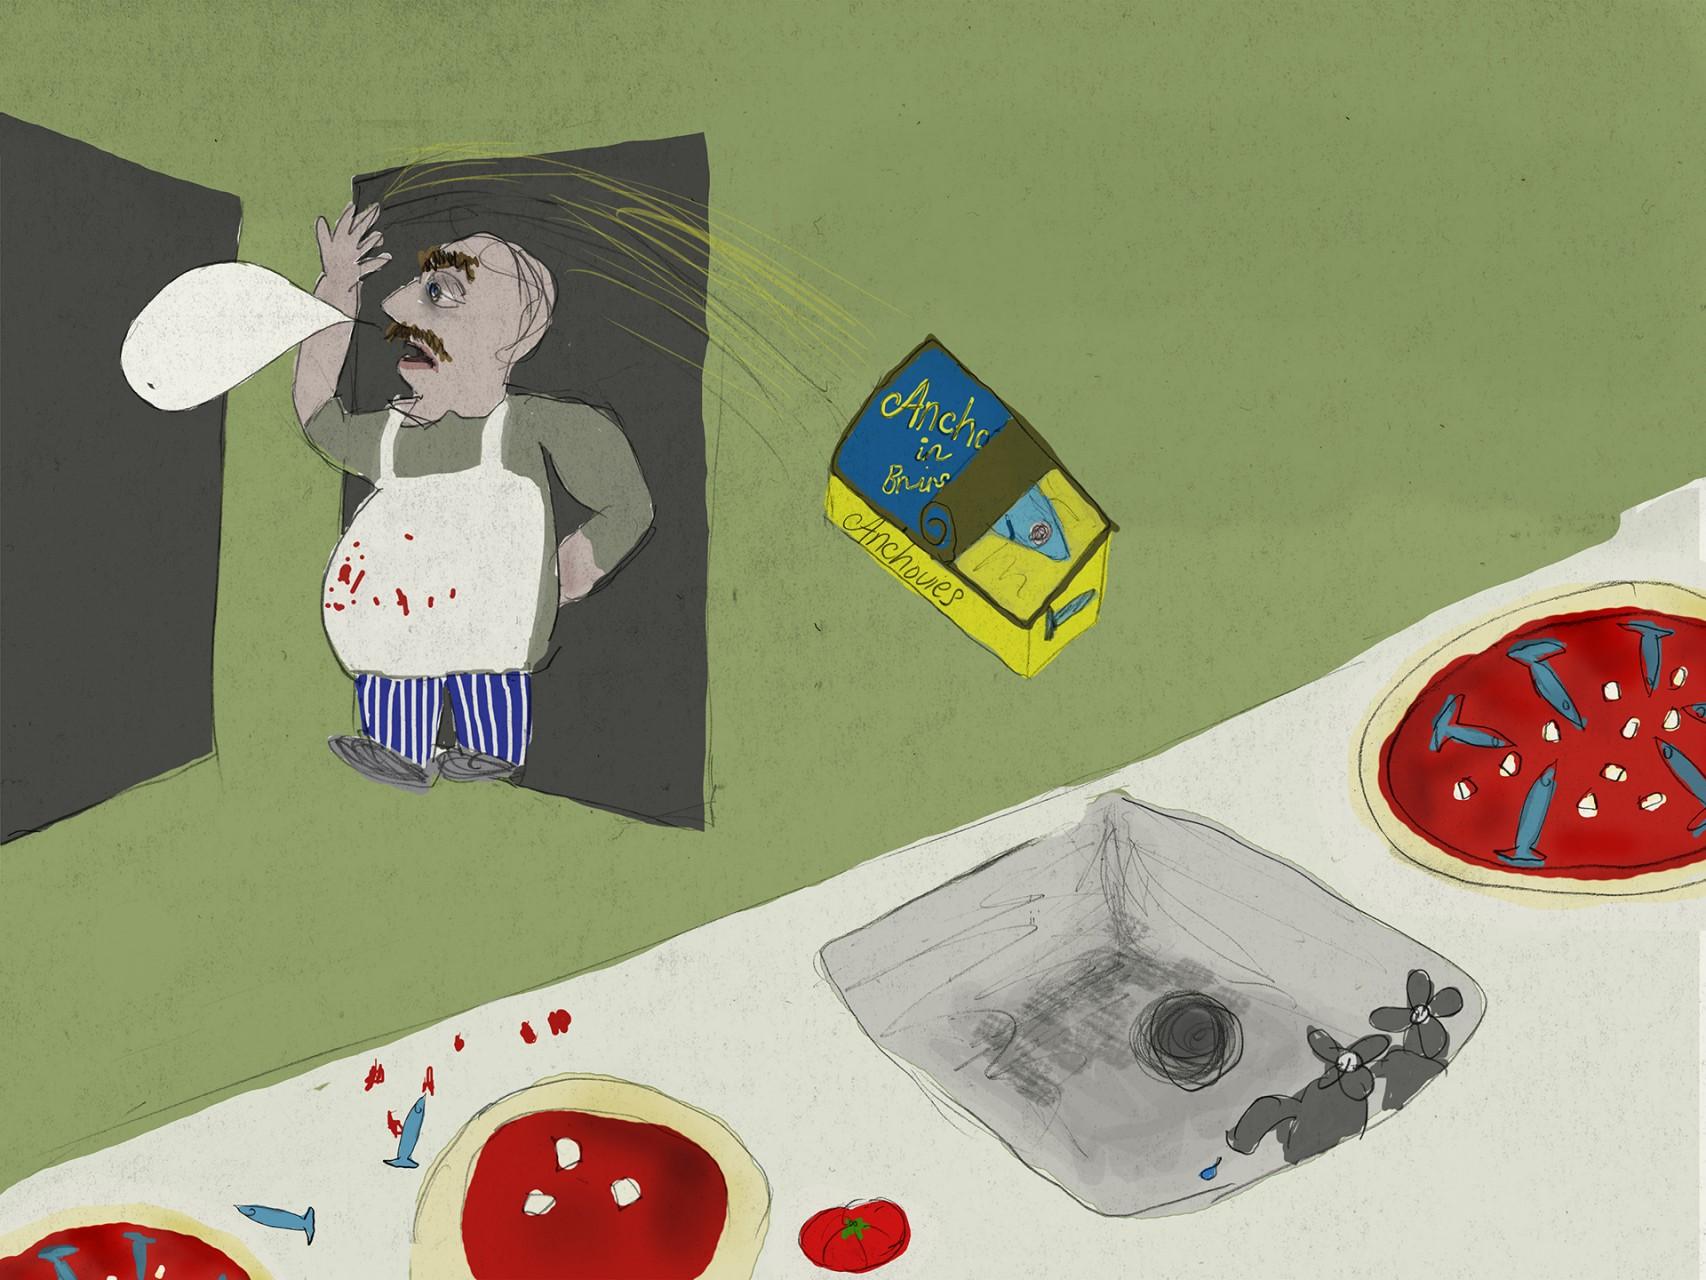 page 3f - chef chucking tin